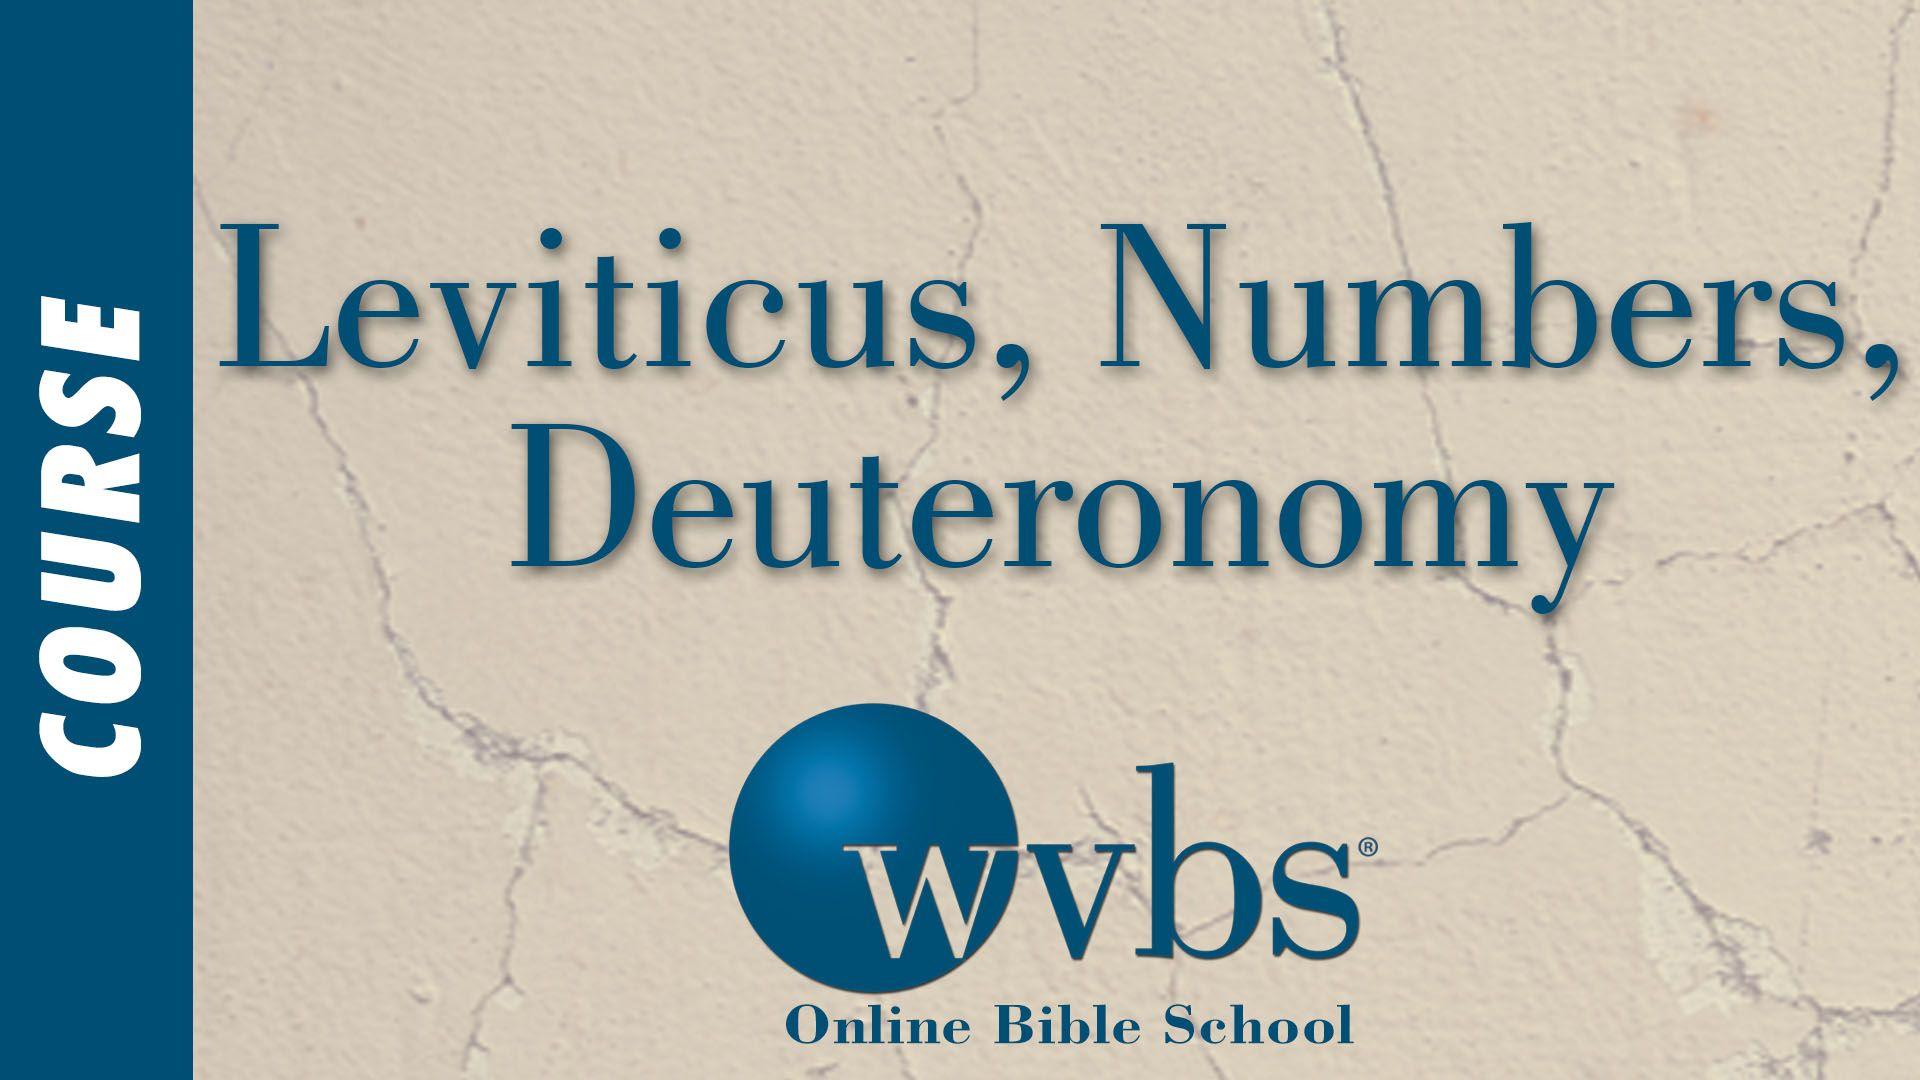 Pin on WVBS Online Bible School